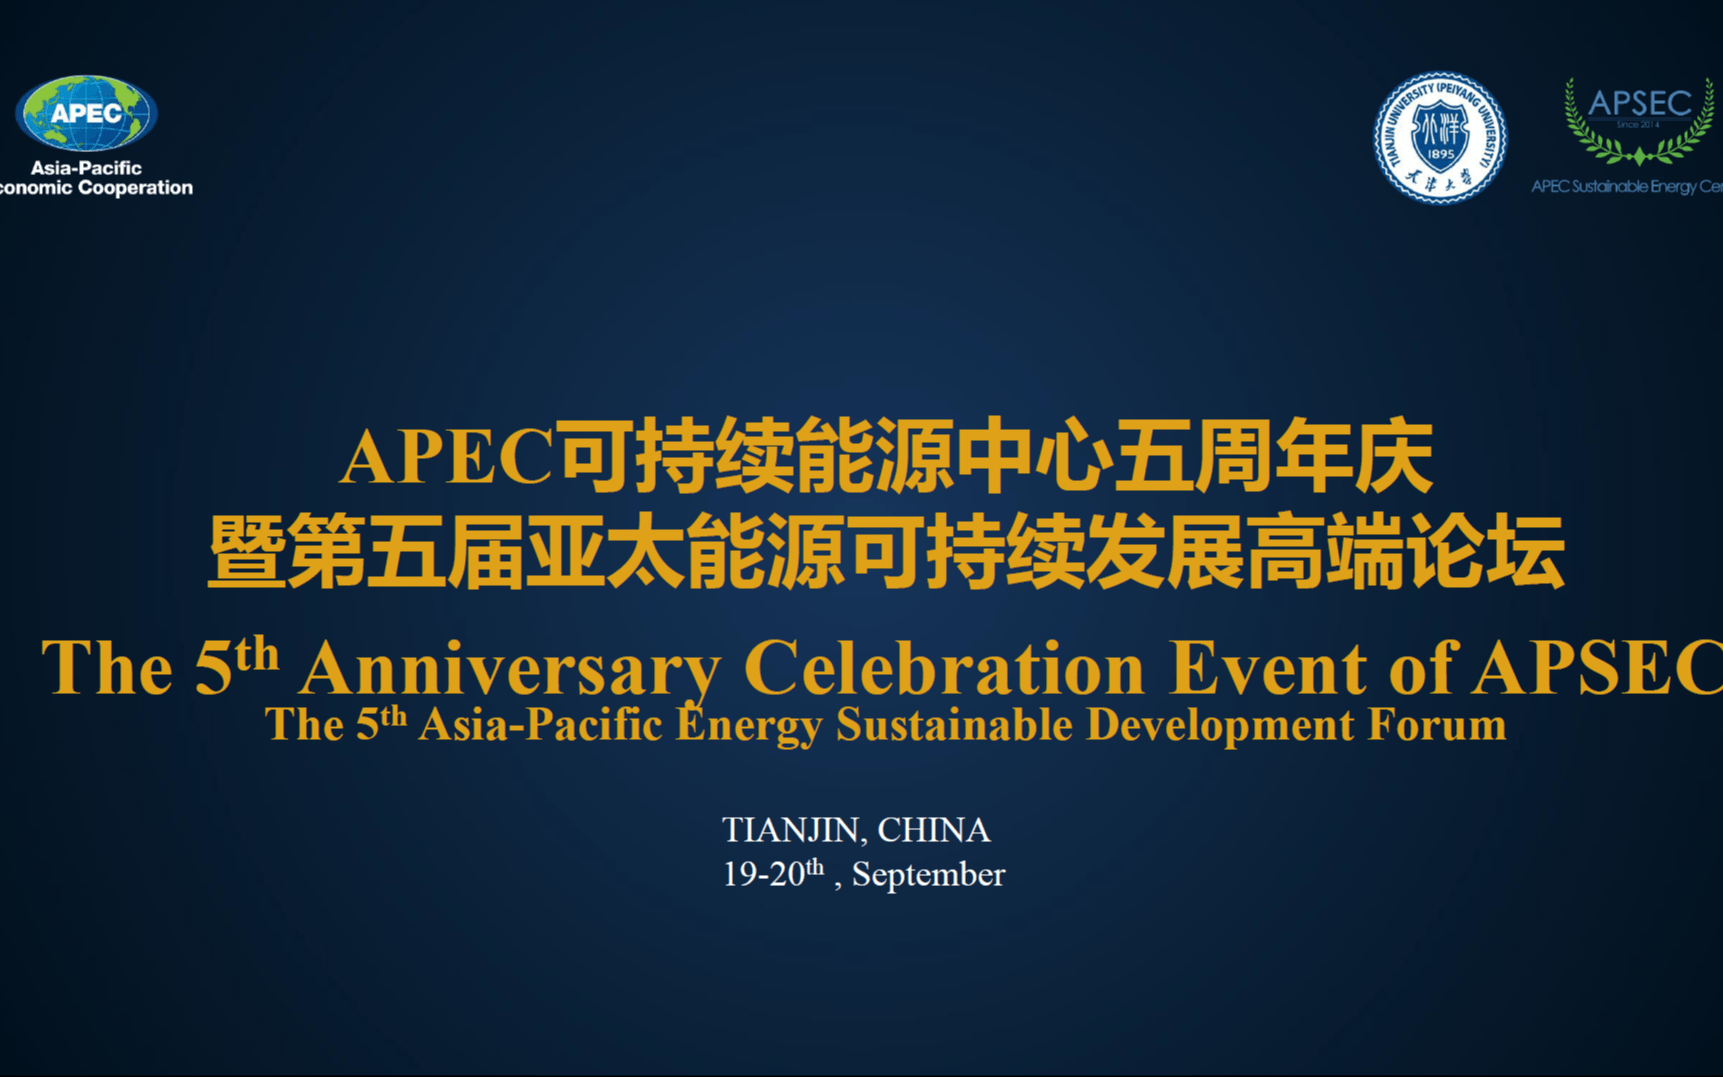 2019APEC可持续能源中心成立五周年庆祝活动暨第五届亚太能源可持续发展高端论坛(天津)